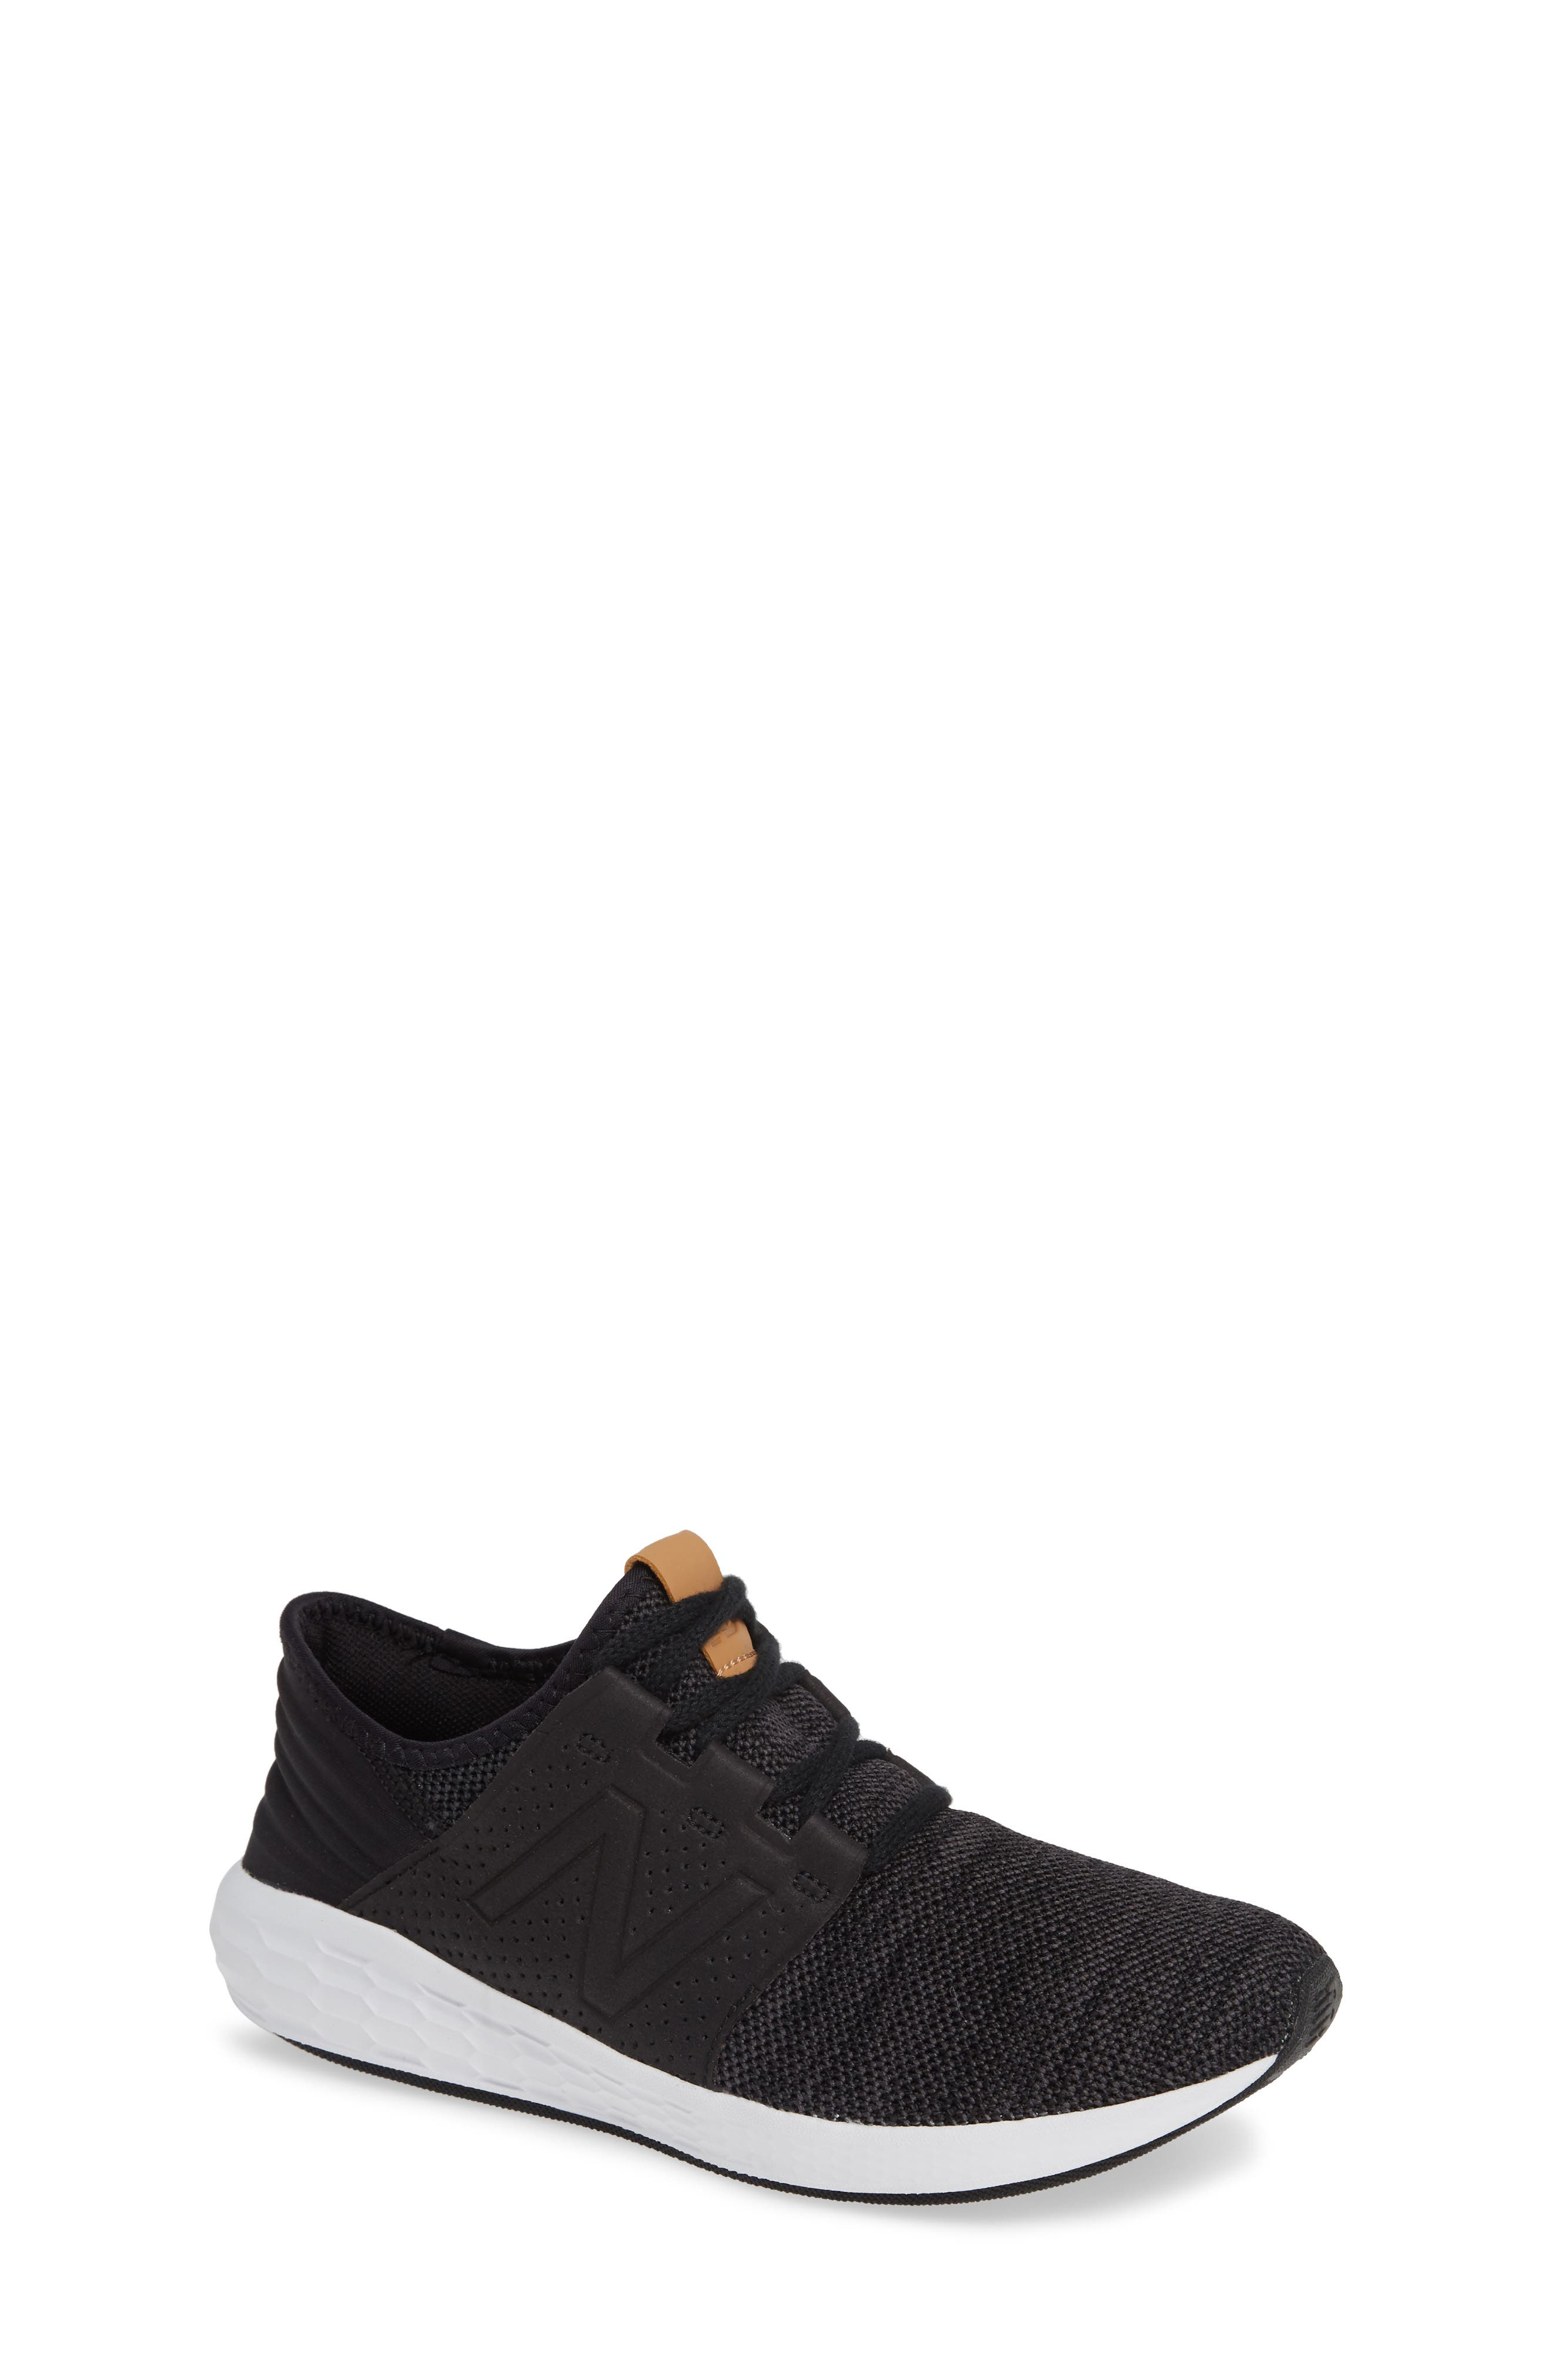 Cruz V2 Sport Sneaker,                             Main thumbnail 1, color,                             BLACK/ MAGNET